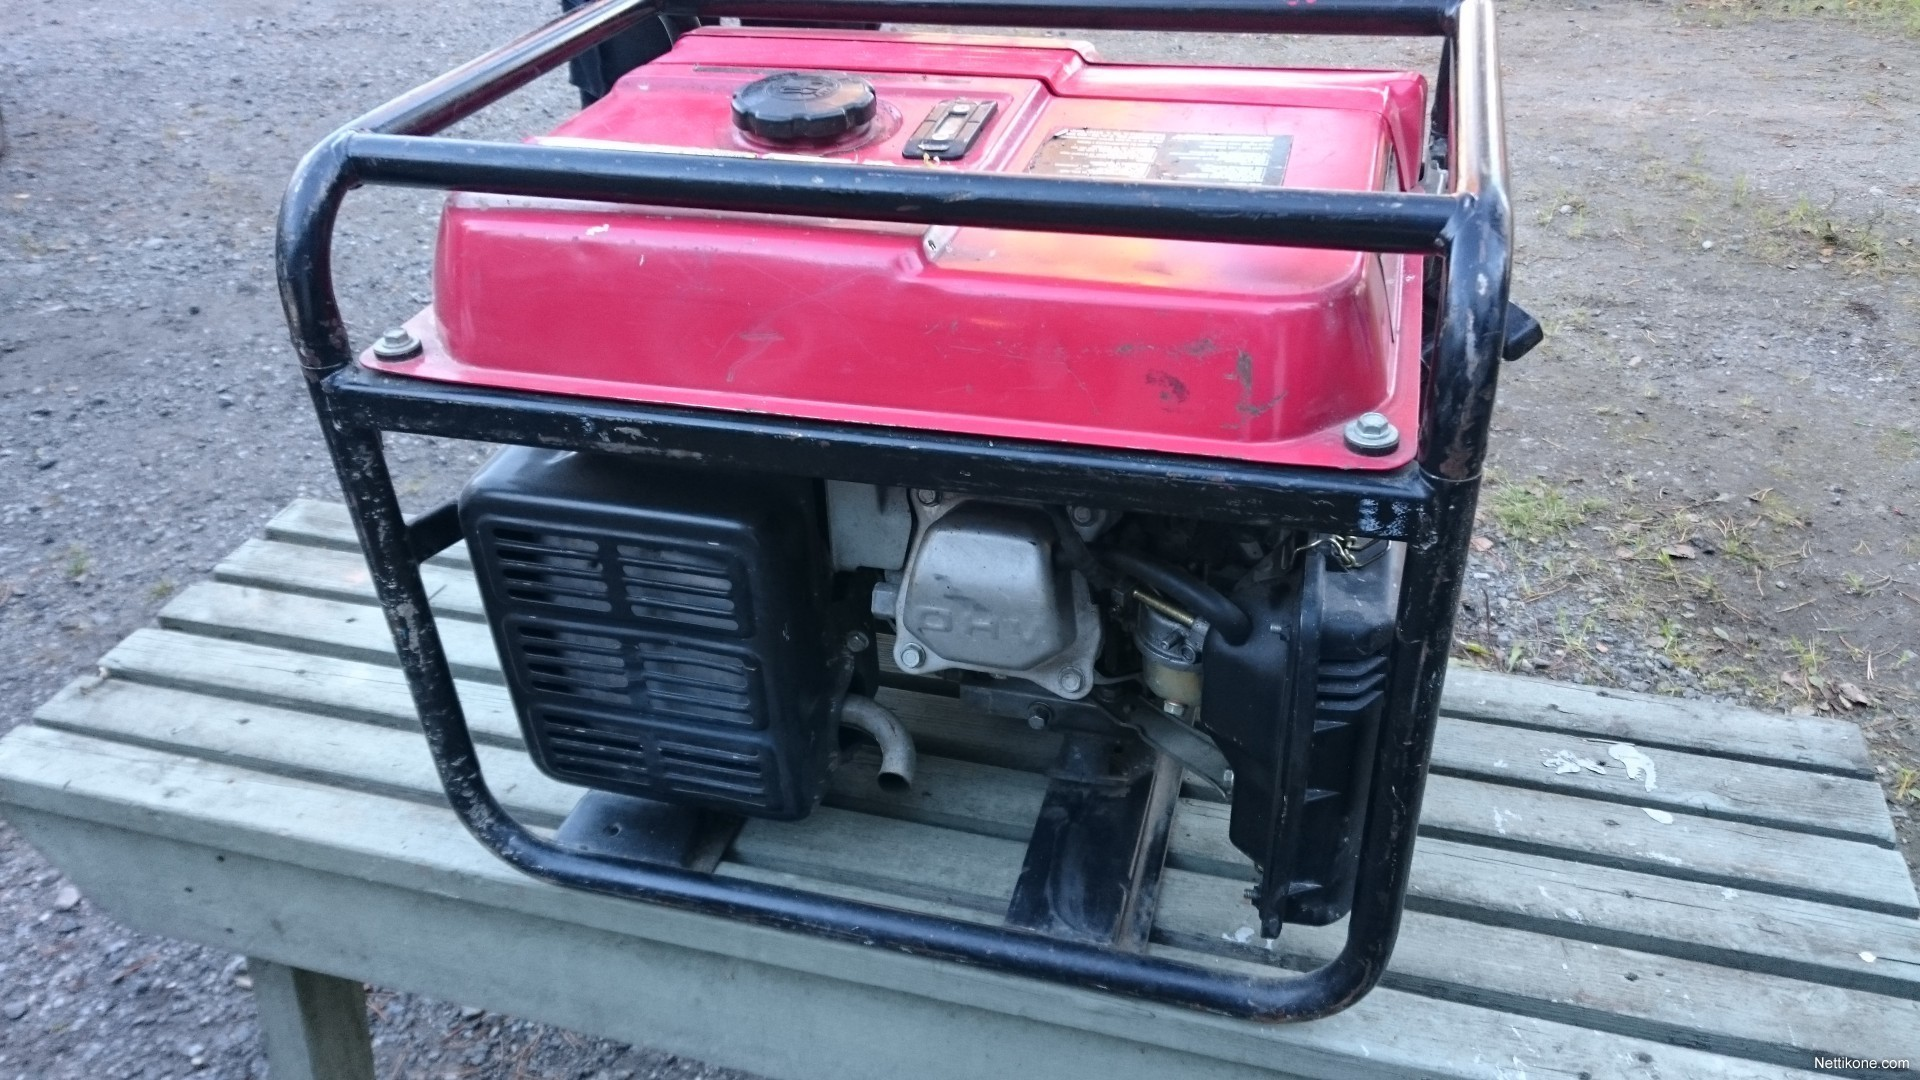 Honda Eb2200x Generator Wiring Diagram Page 3 And Of Parts Em2200x A Jpn Vin Gx140 1000001 To 3263982 Source Em 2200x Nettikone Aggregaa A50c4b84df8dc229 Large 1700532